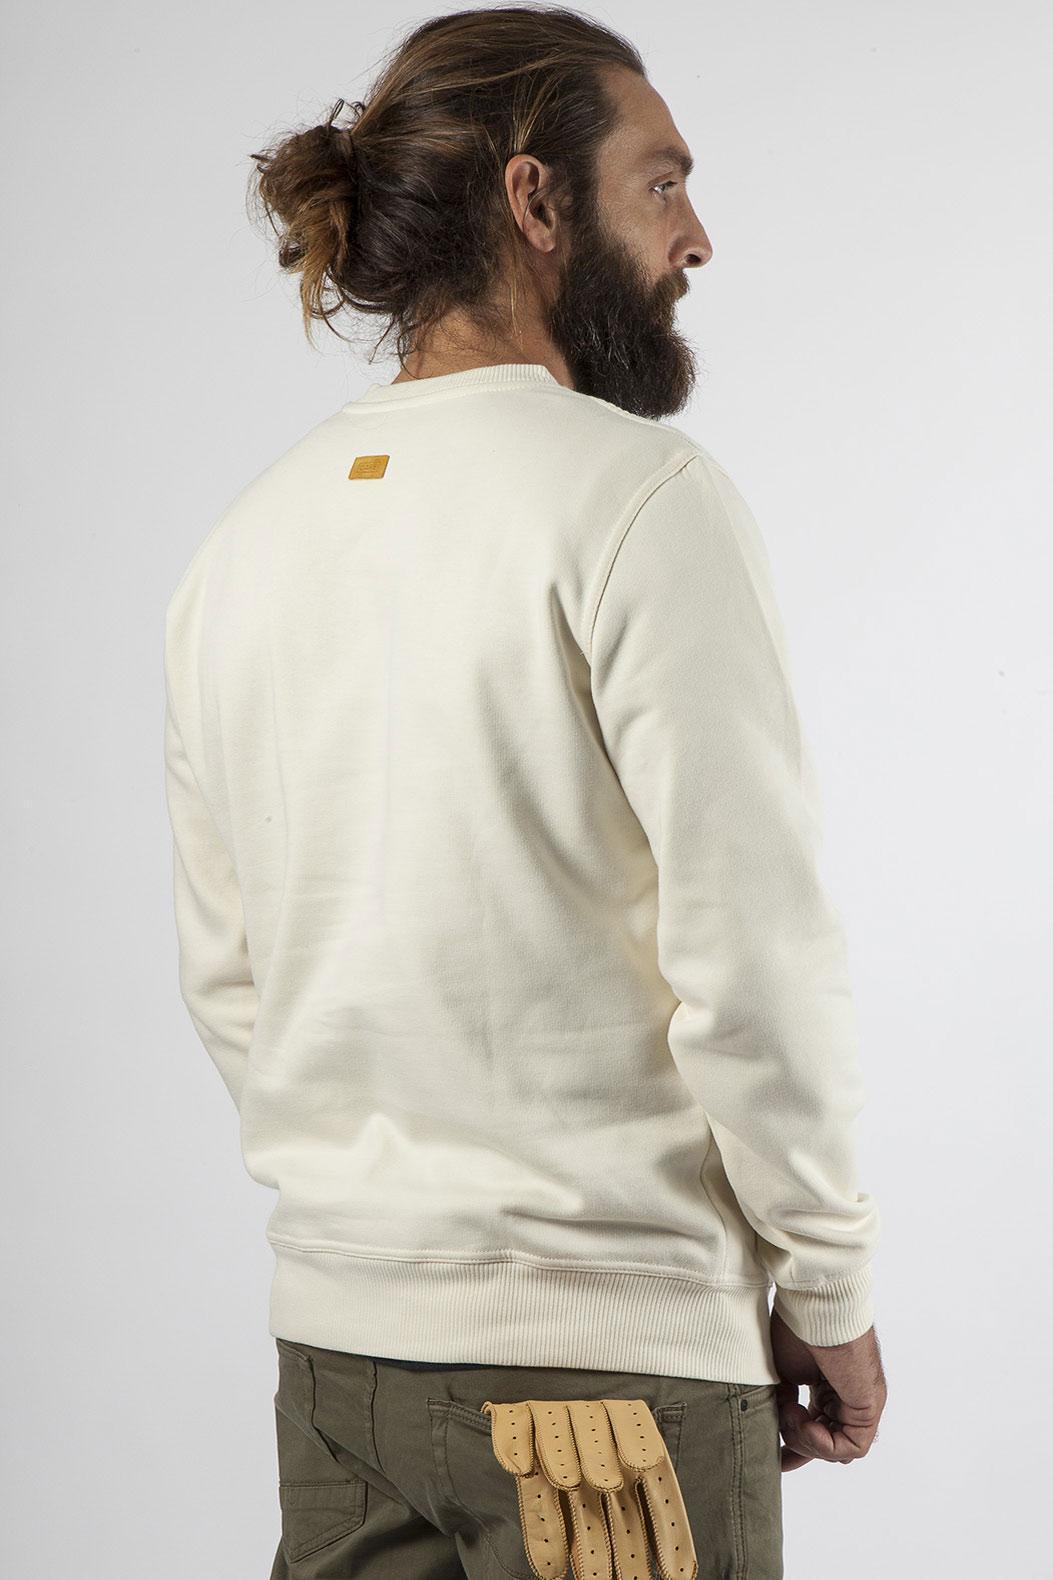 white-sweatshirt-leather-patch-back